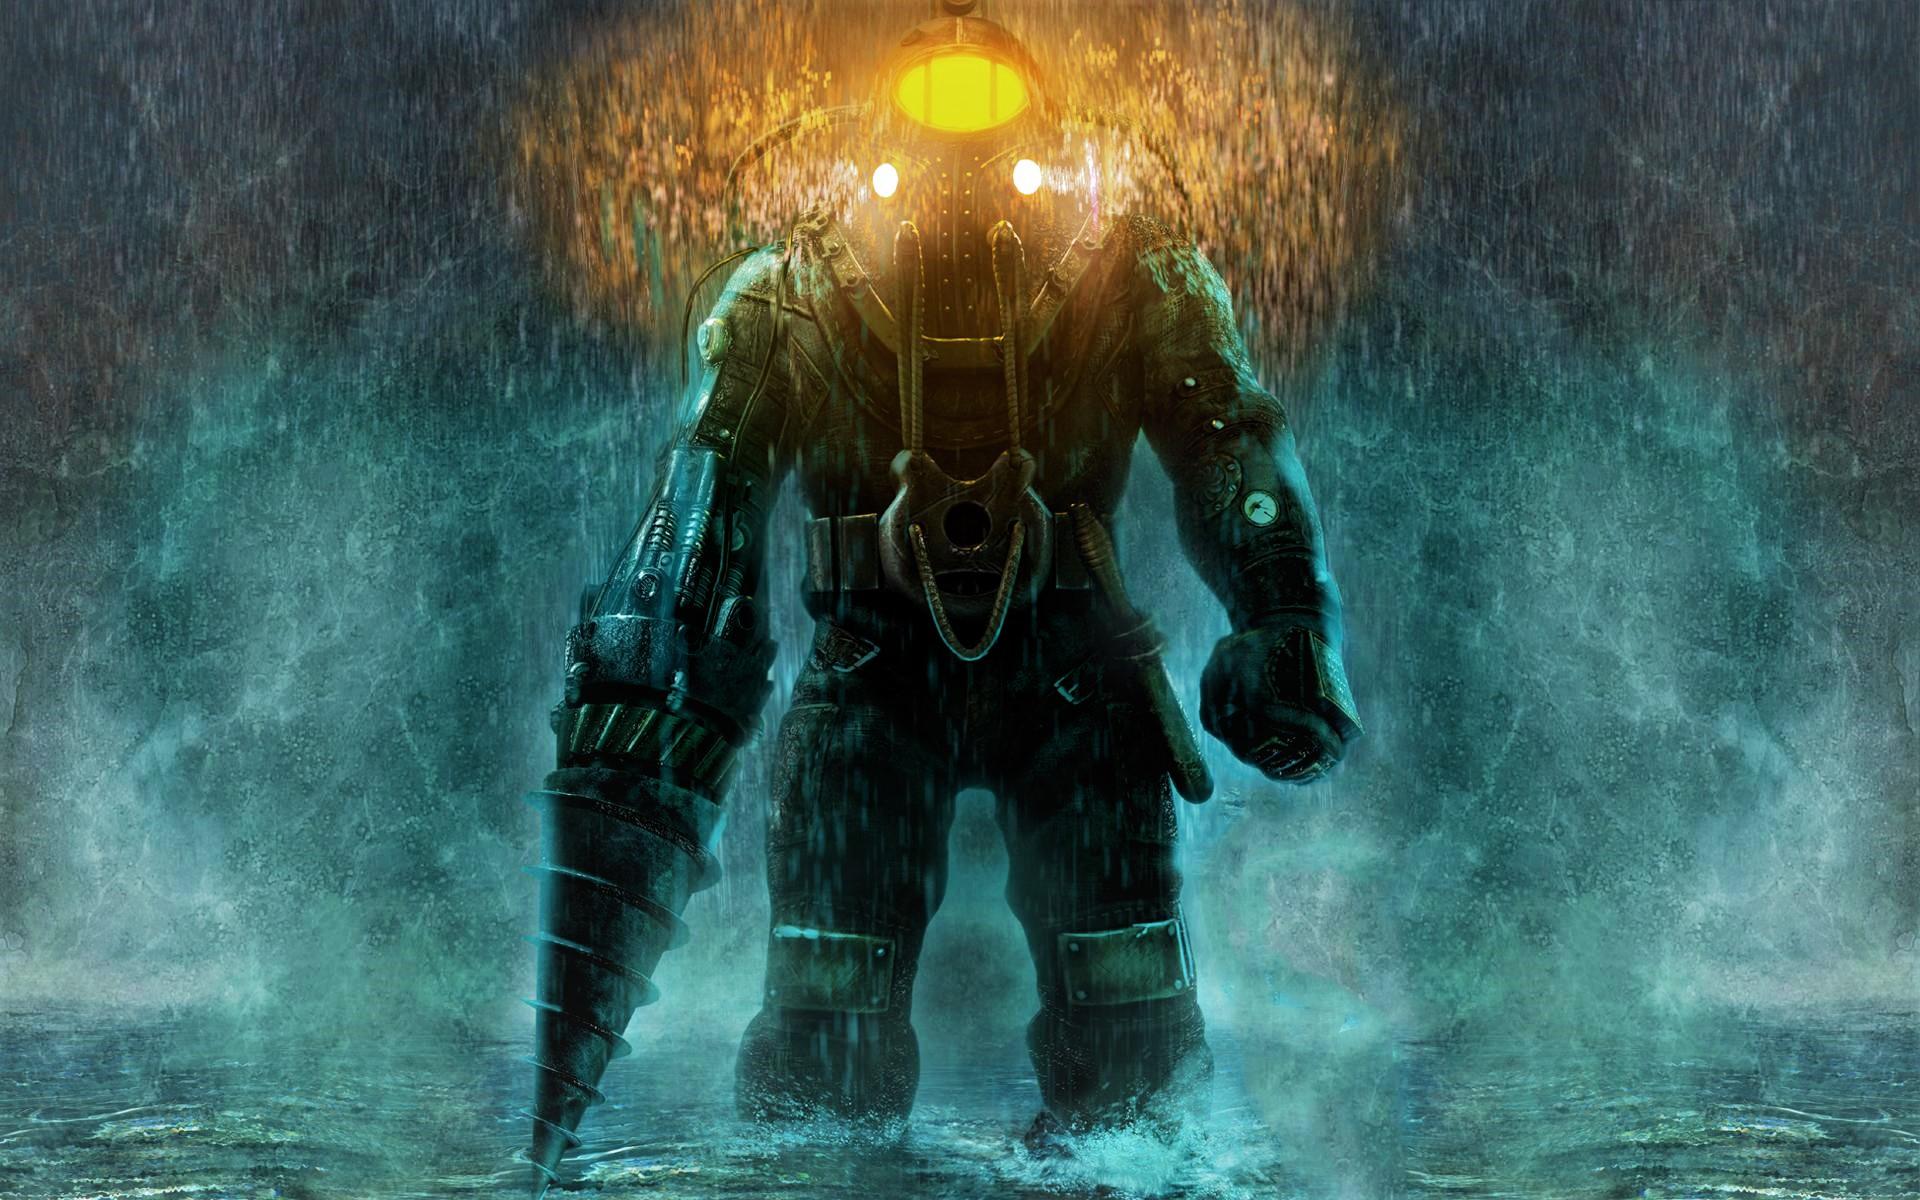 Wallpaper Big Daddy Video Games Bioshock 2 1920x1200